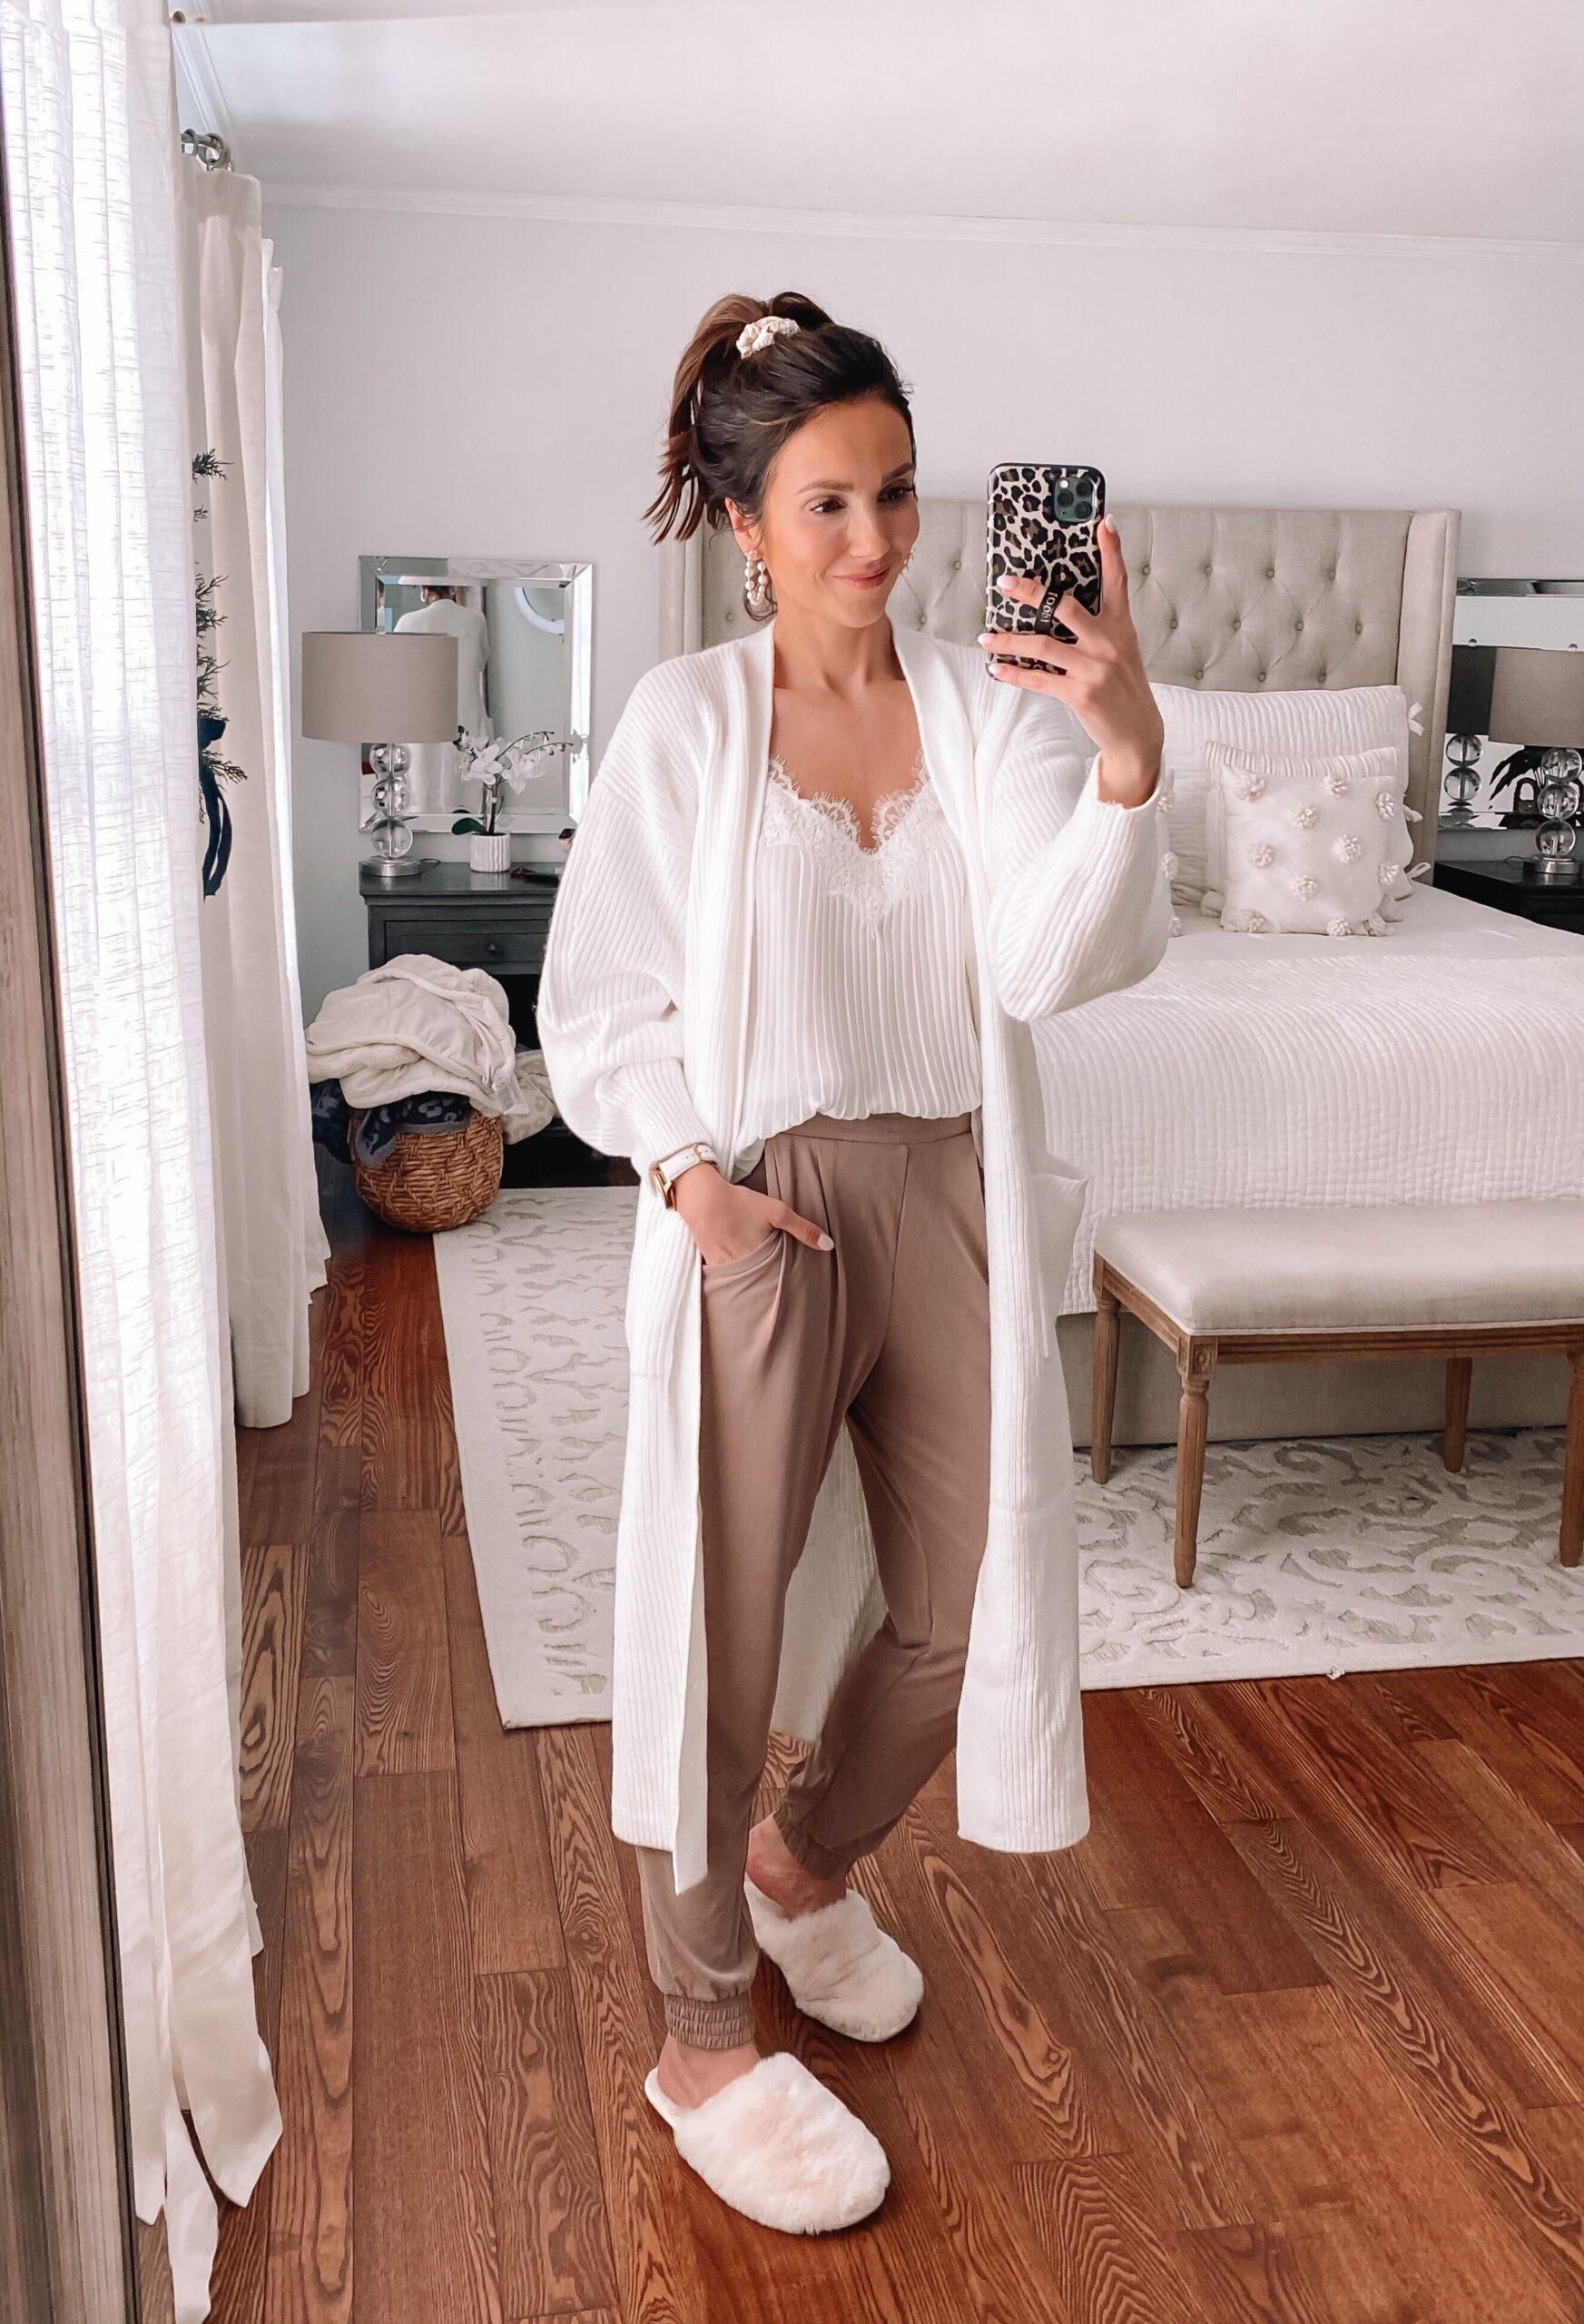 express loungewear, white cardigan, white slippers